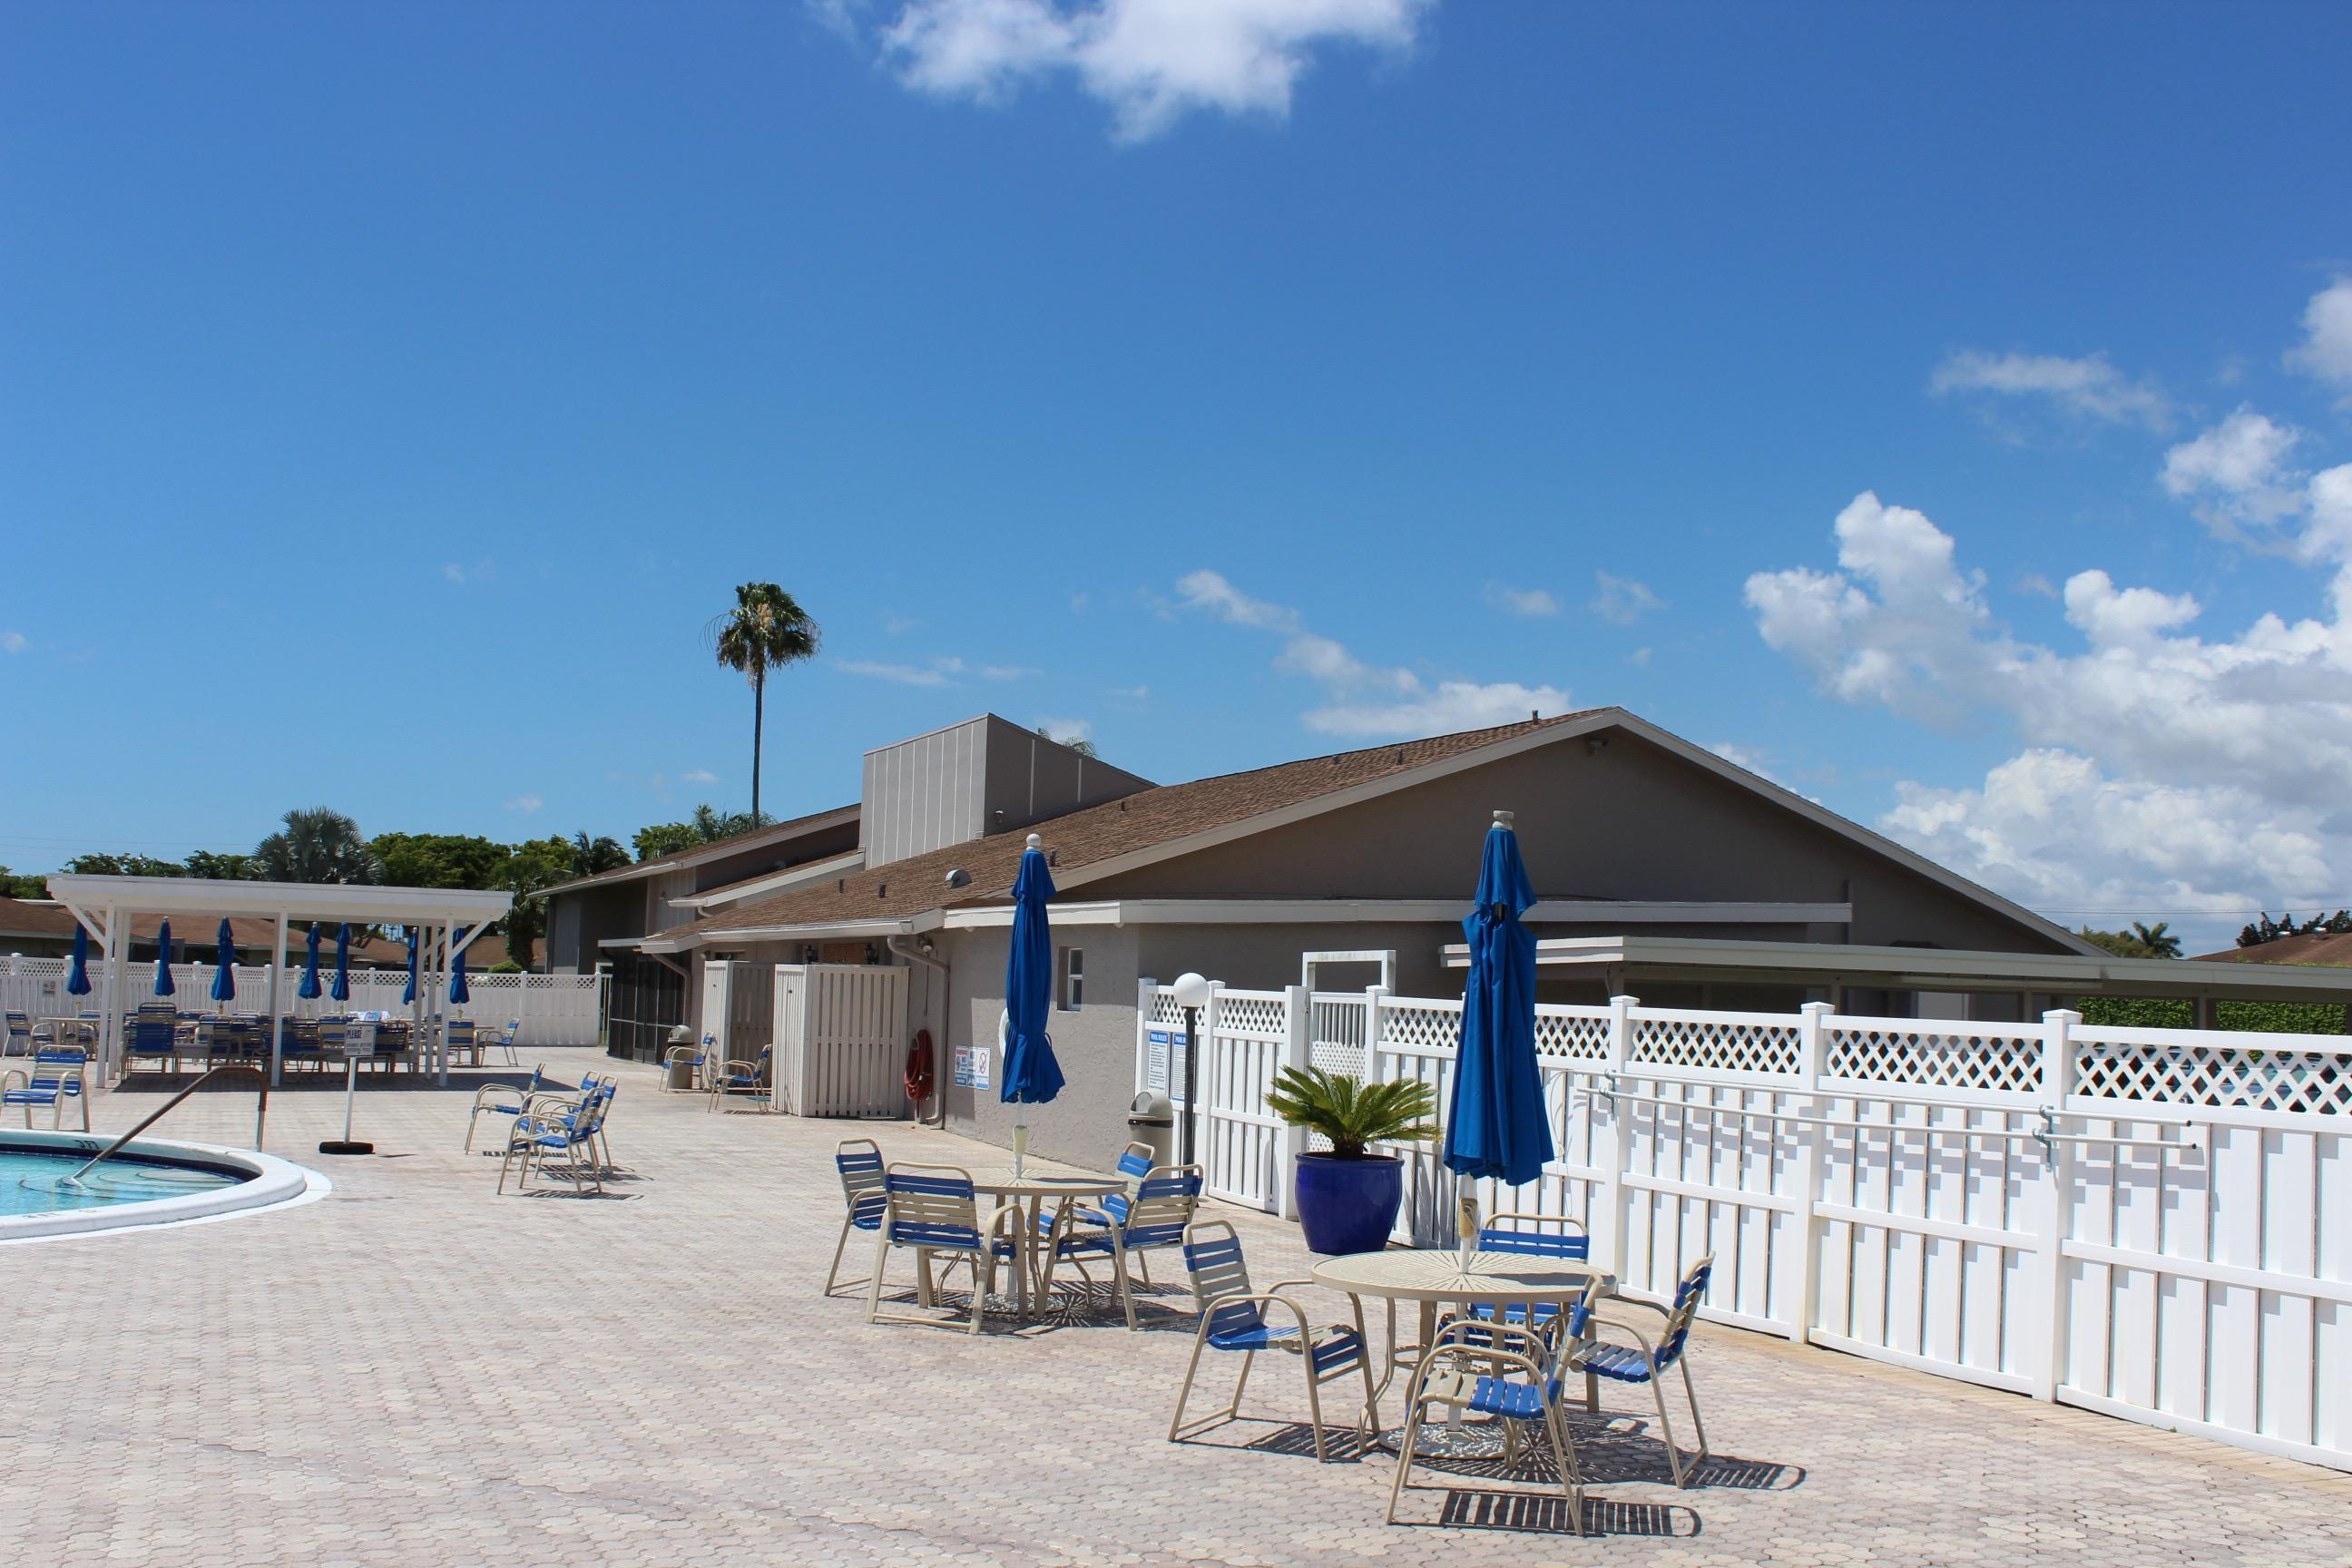 VILLAGES OF ORIOLE DELRAY BEACH FLORIDA